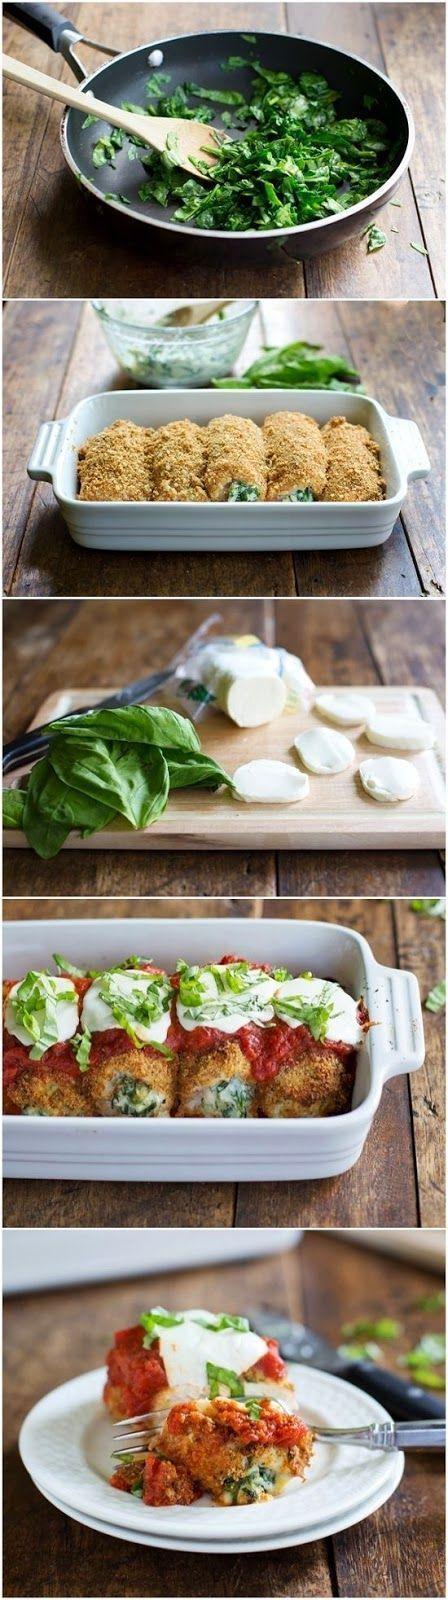 Baked Mozzarella Chicken Roll recipe